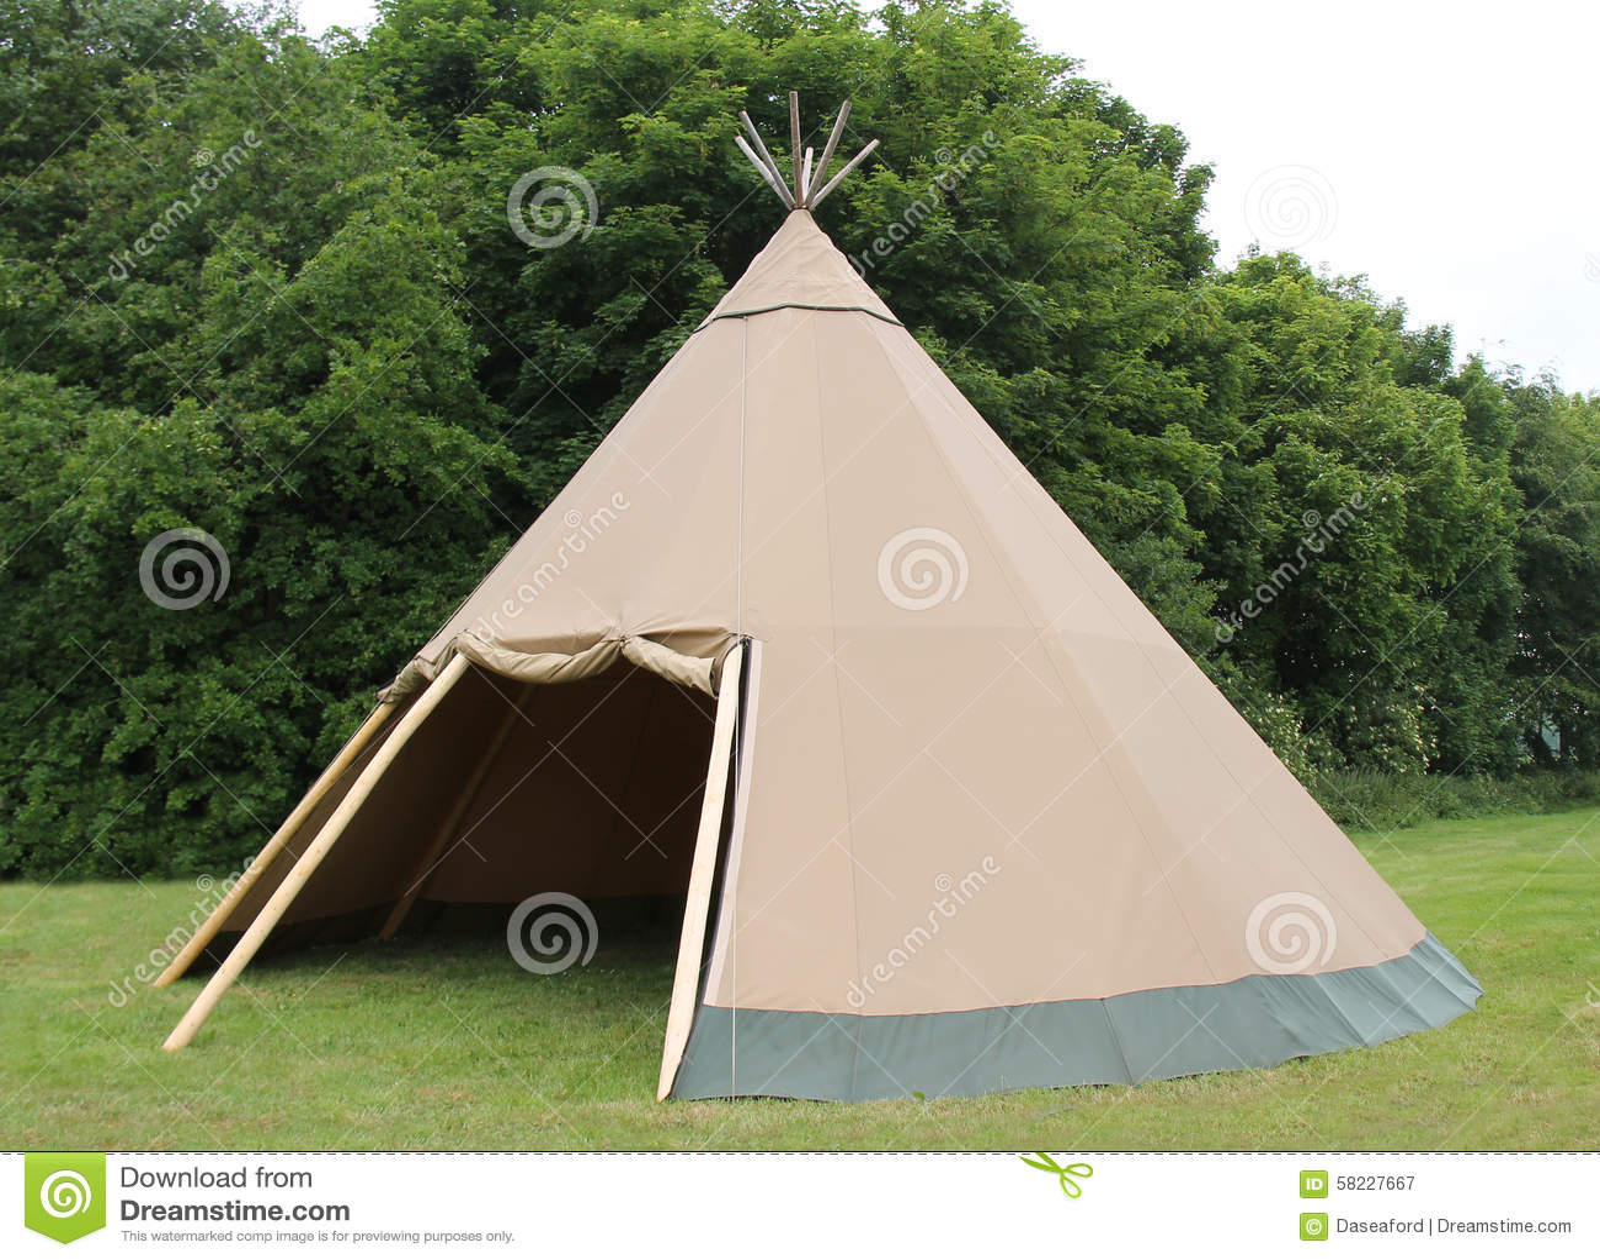 Wigwam Tent. & Wigwam Tent. stock image. Image of poles pegs vintage - 58227667